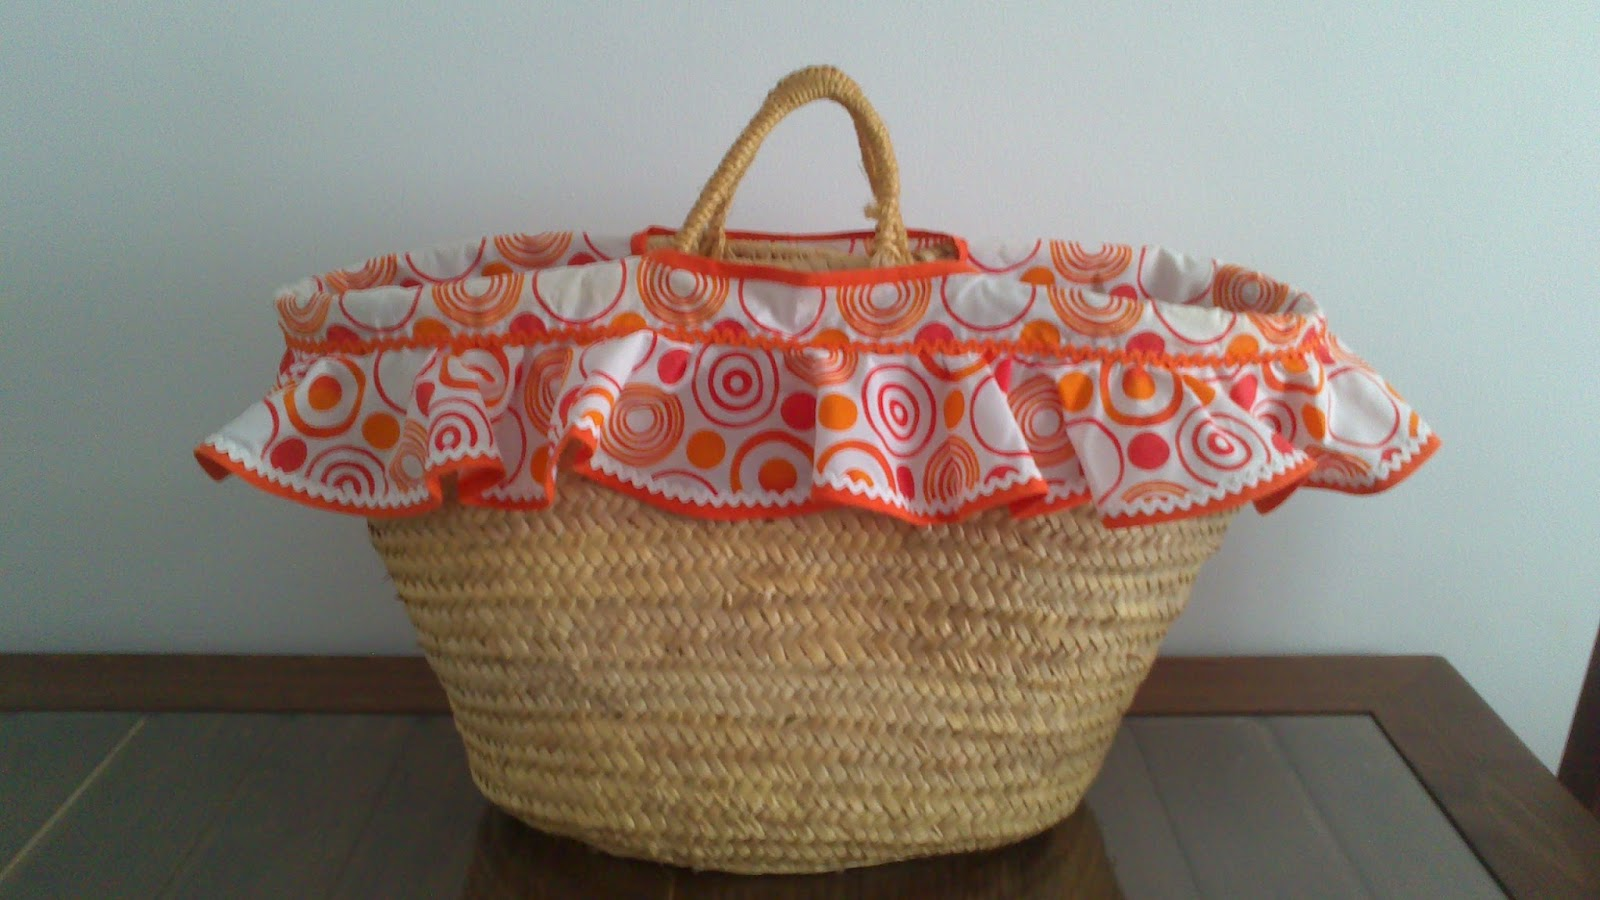 La aguja de mam cestas de playa - Cestas para la playa ...